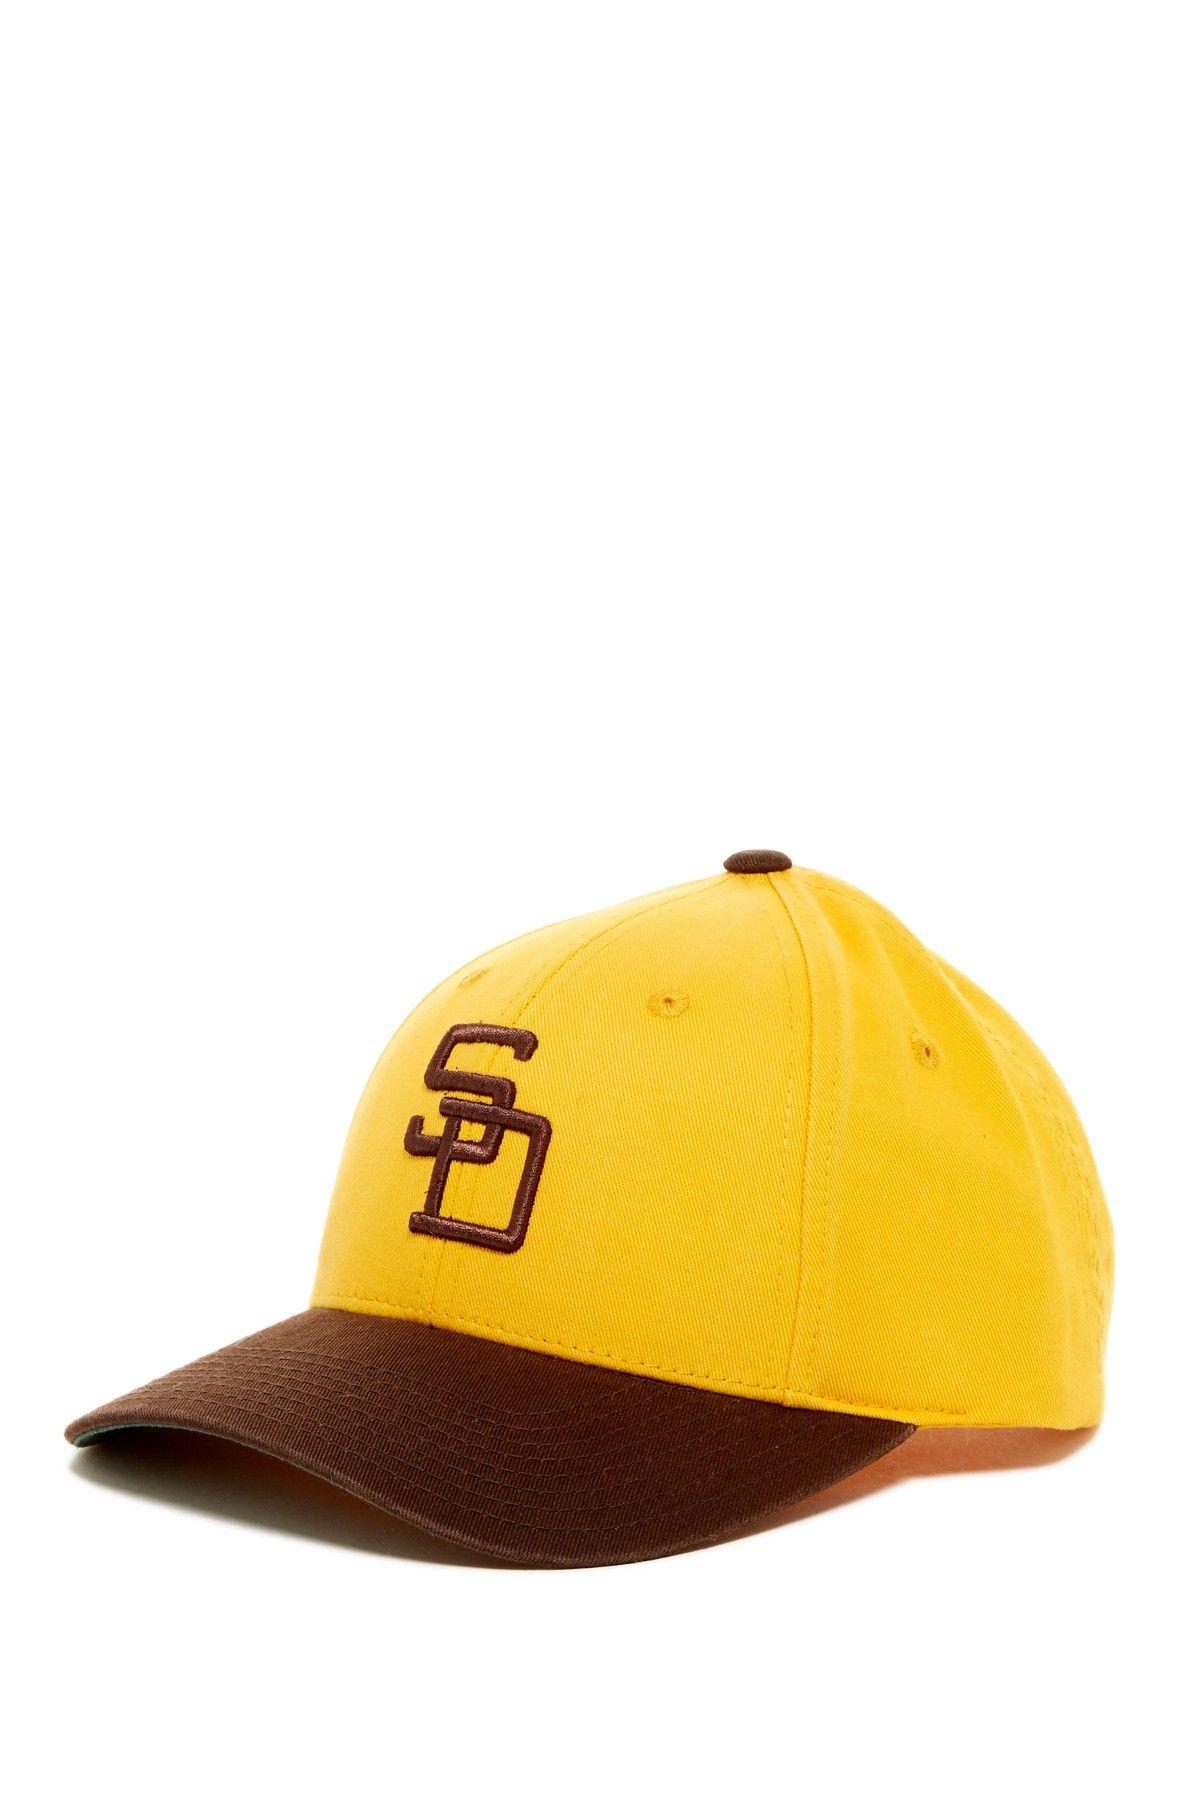 San Diego Padres 72 Pastime Baseball Cap  c6e52bdb85f